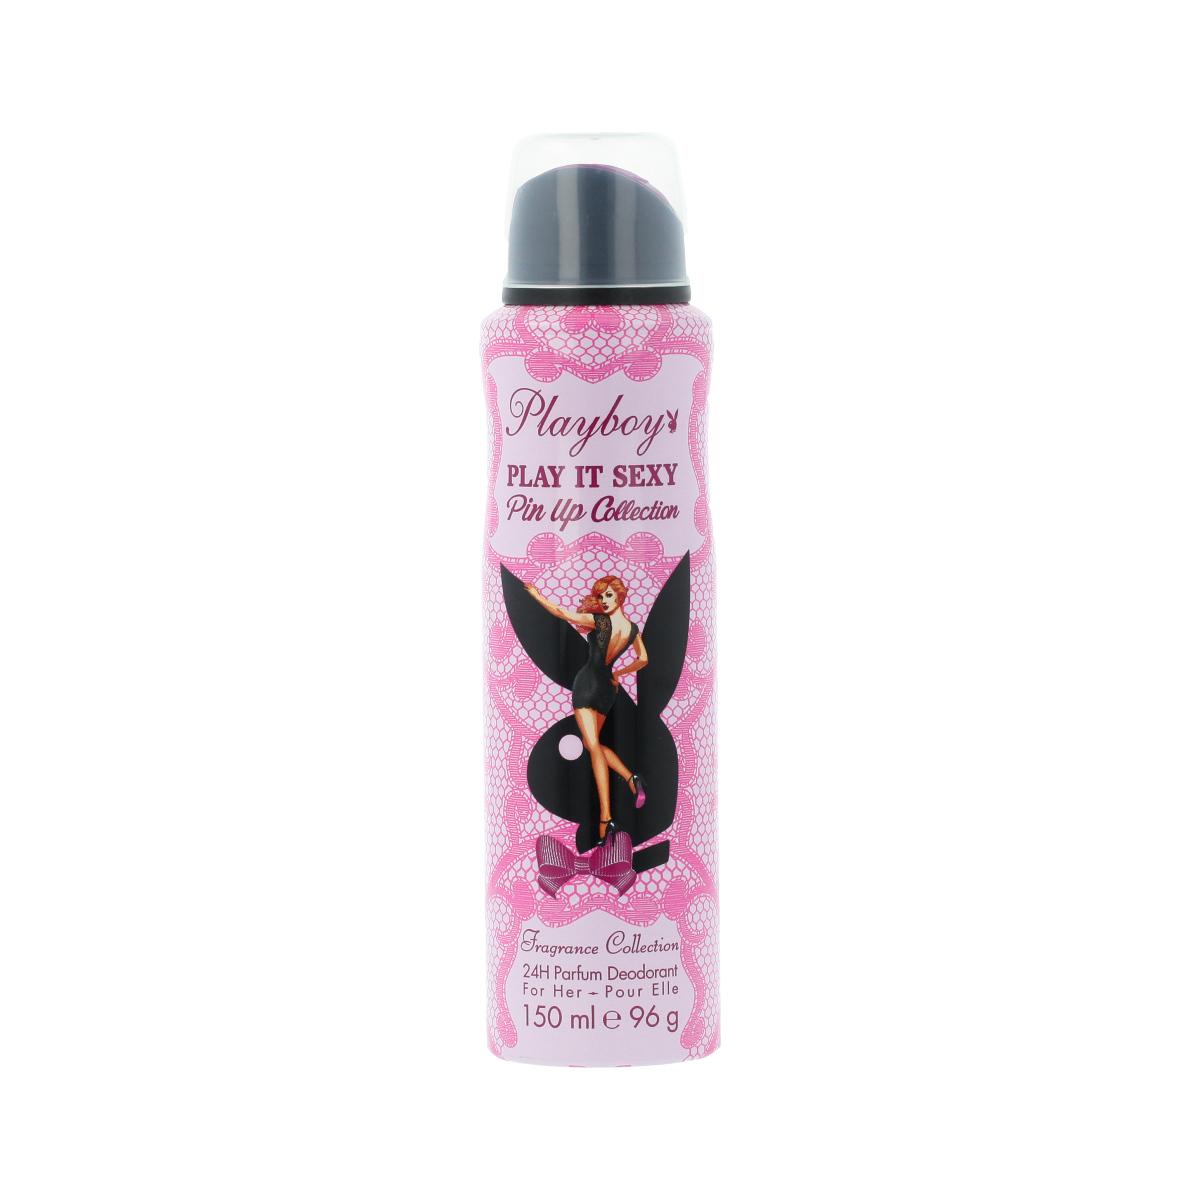 Playboy Play It Sexy Deodorant im Spray 150 ml (woman)